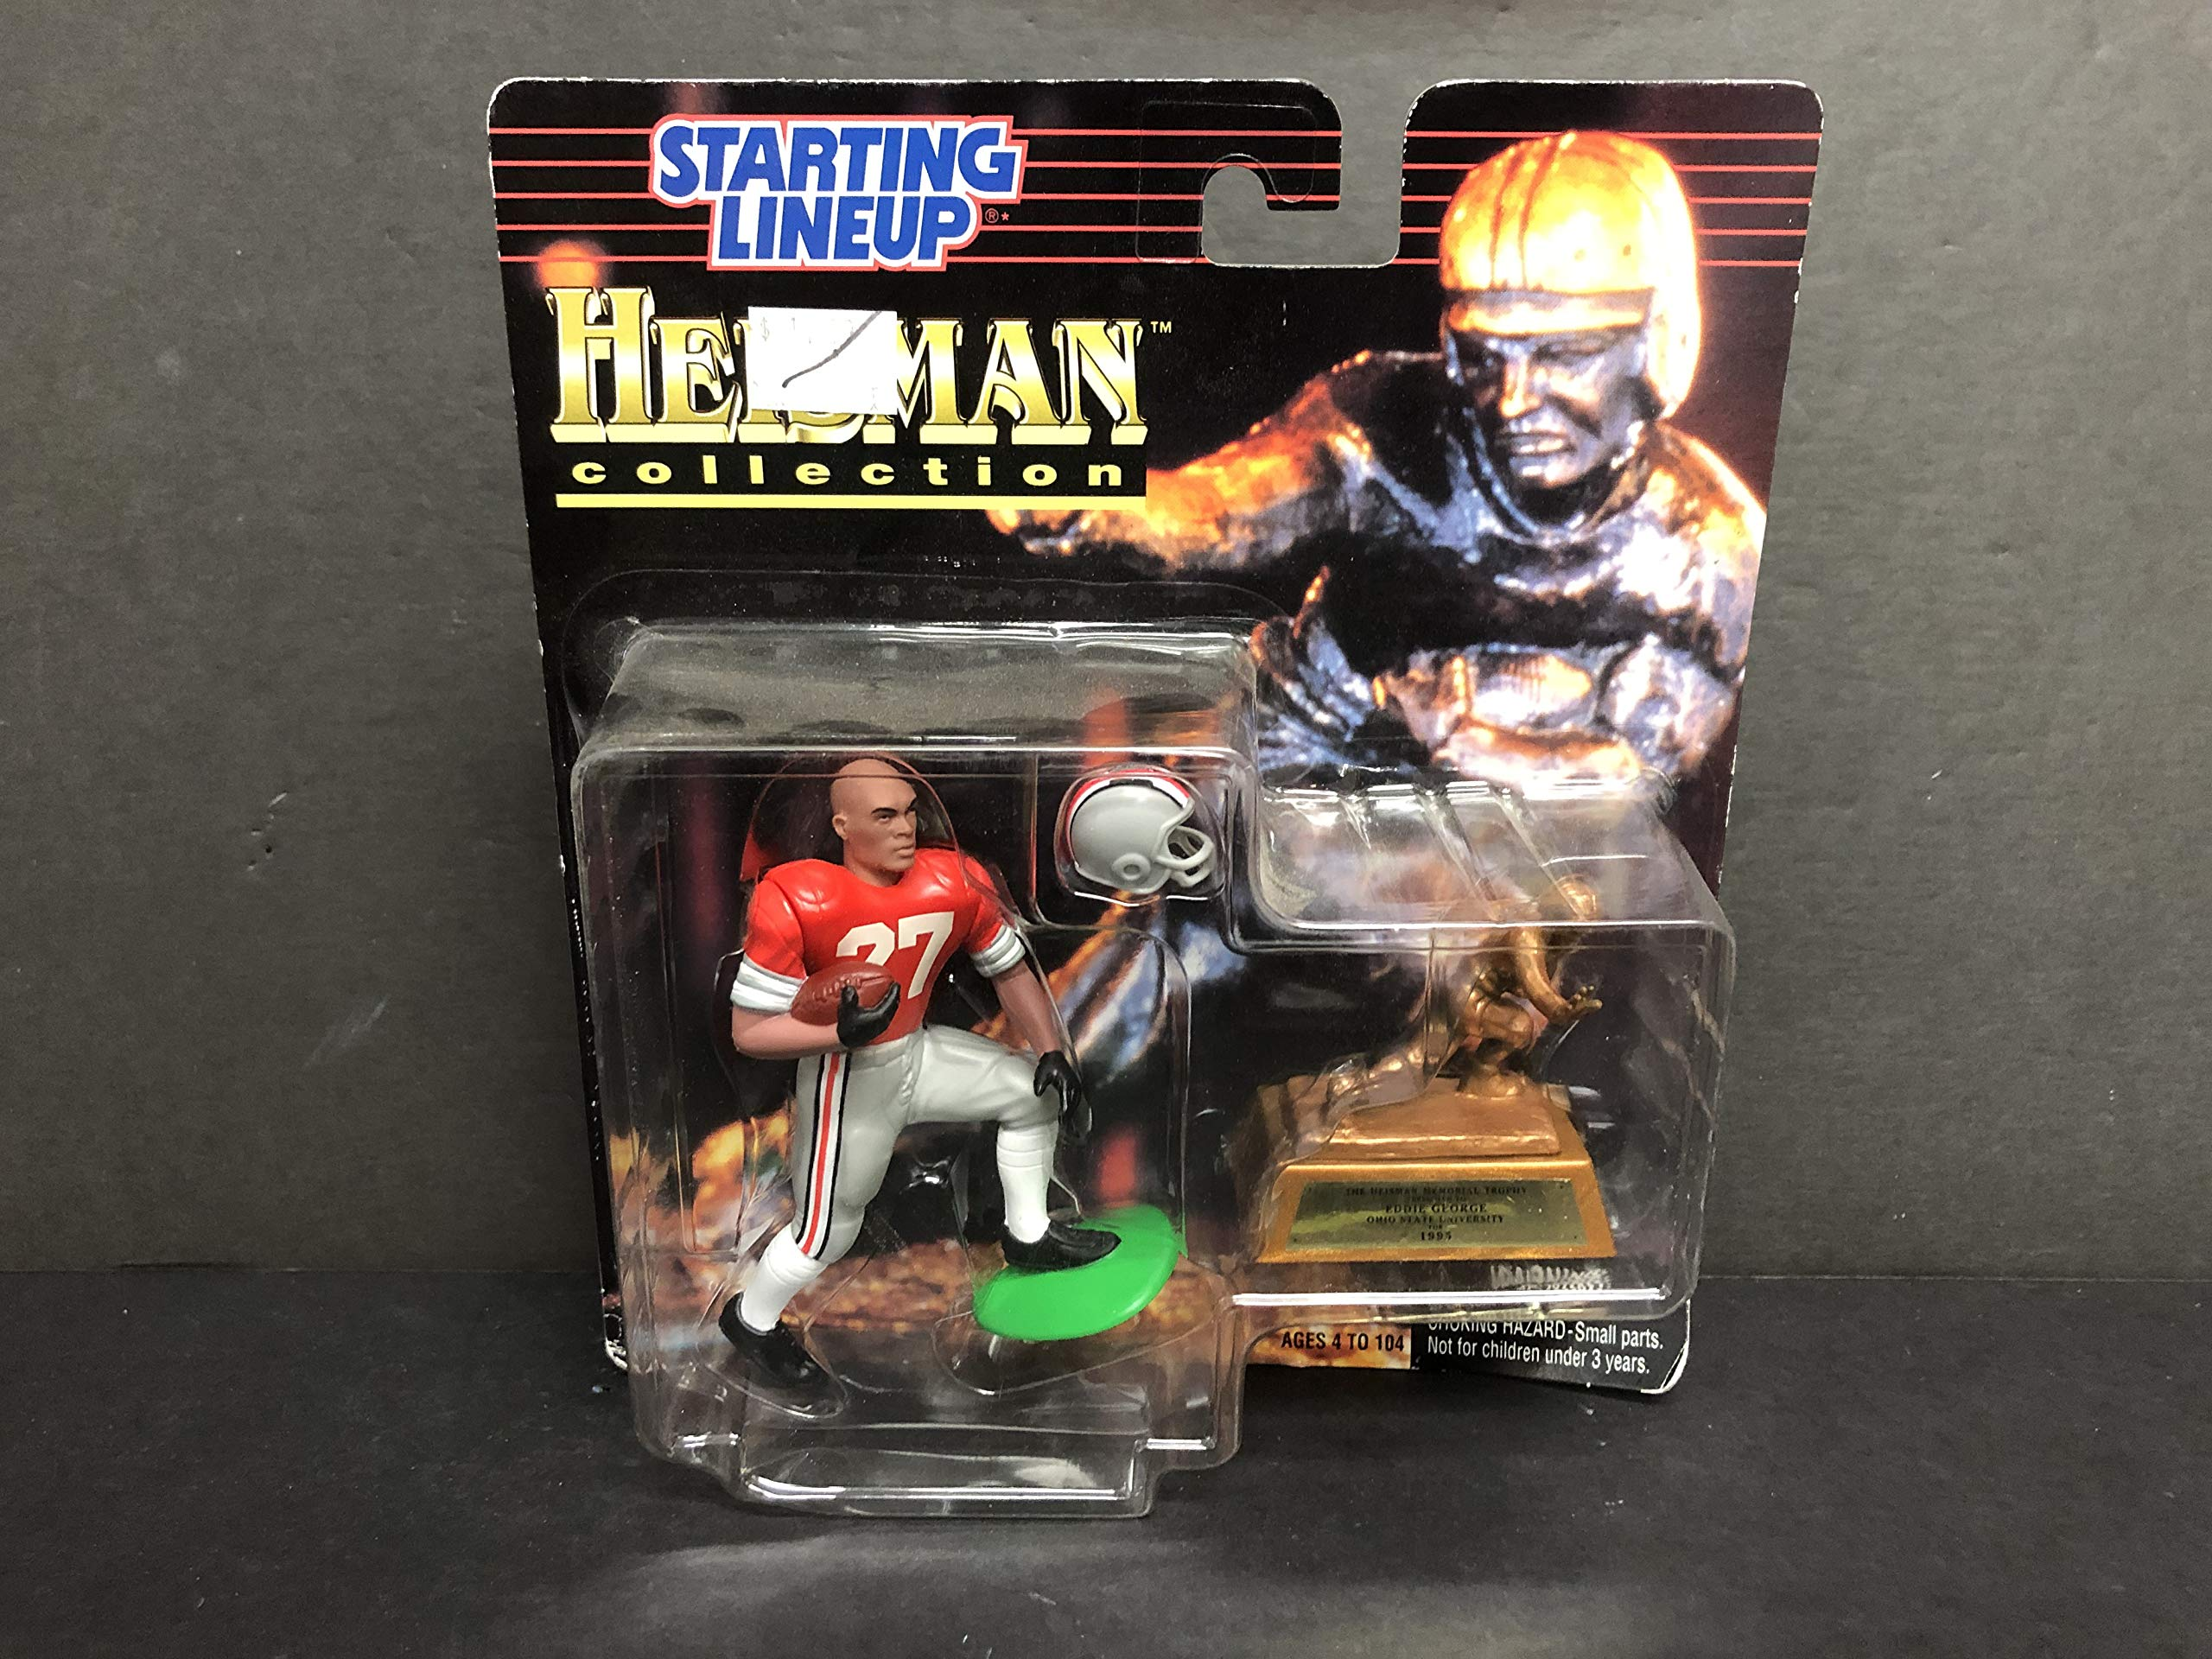 1997 Heisman Trophy Winner Football Action Figure Eddie George Ohio State University 1995